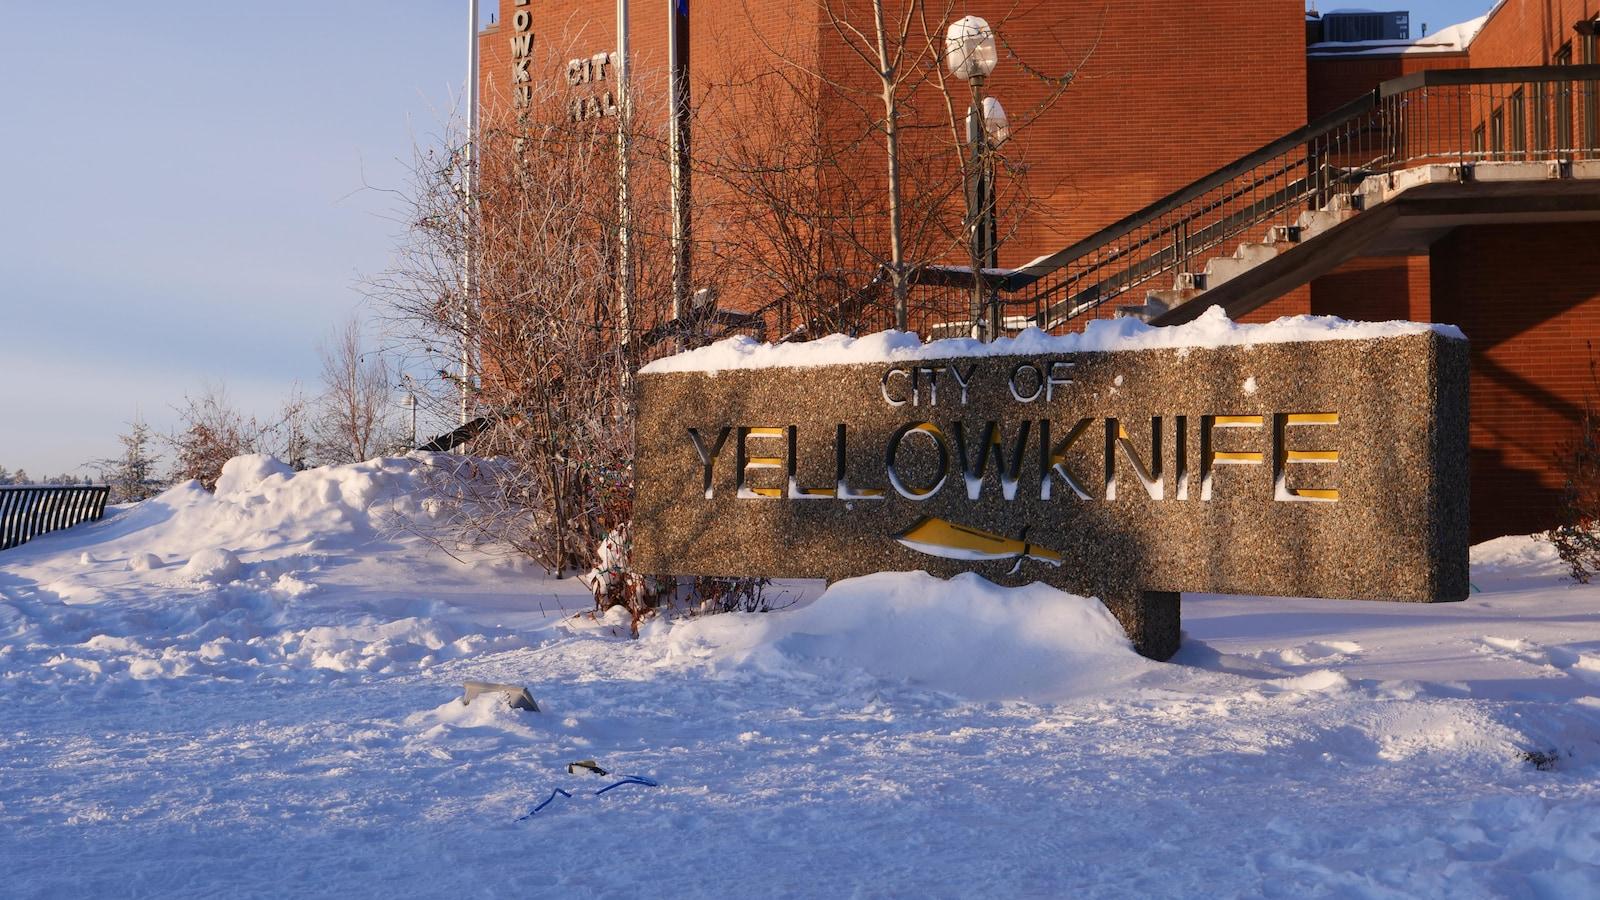 La façade de l'hôtel de ville de Yellowknife.